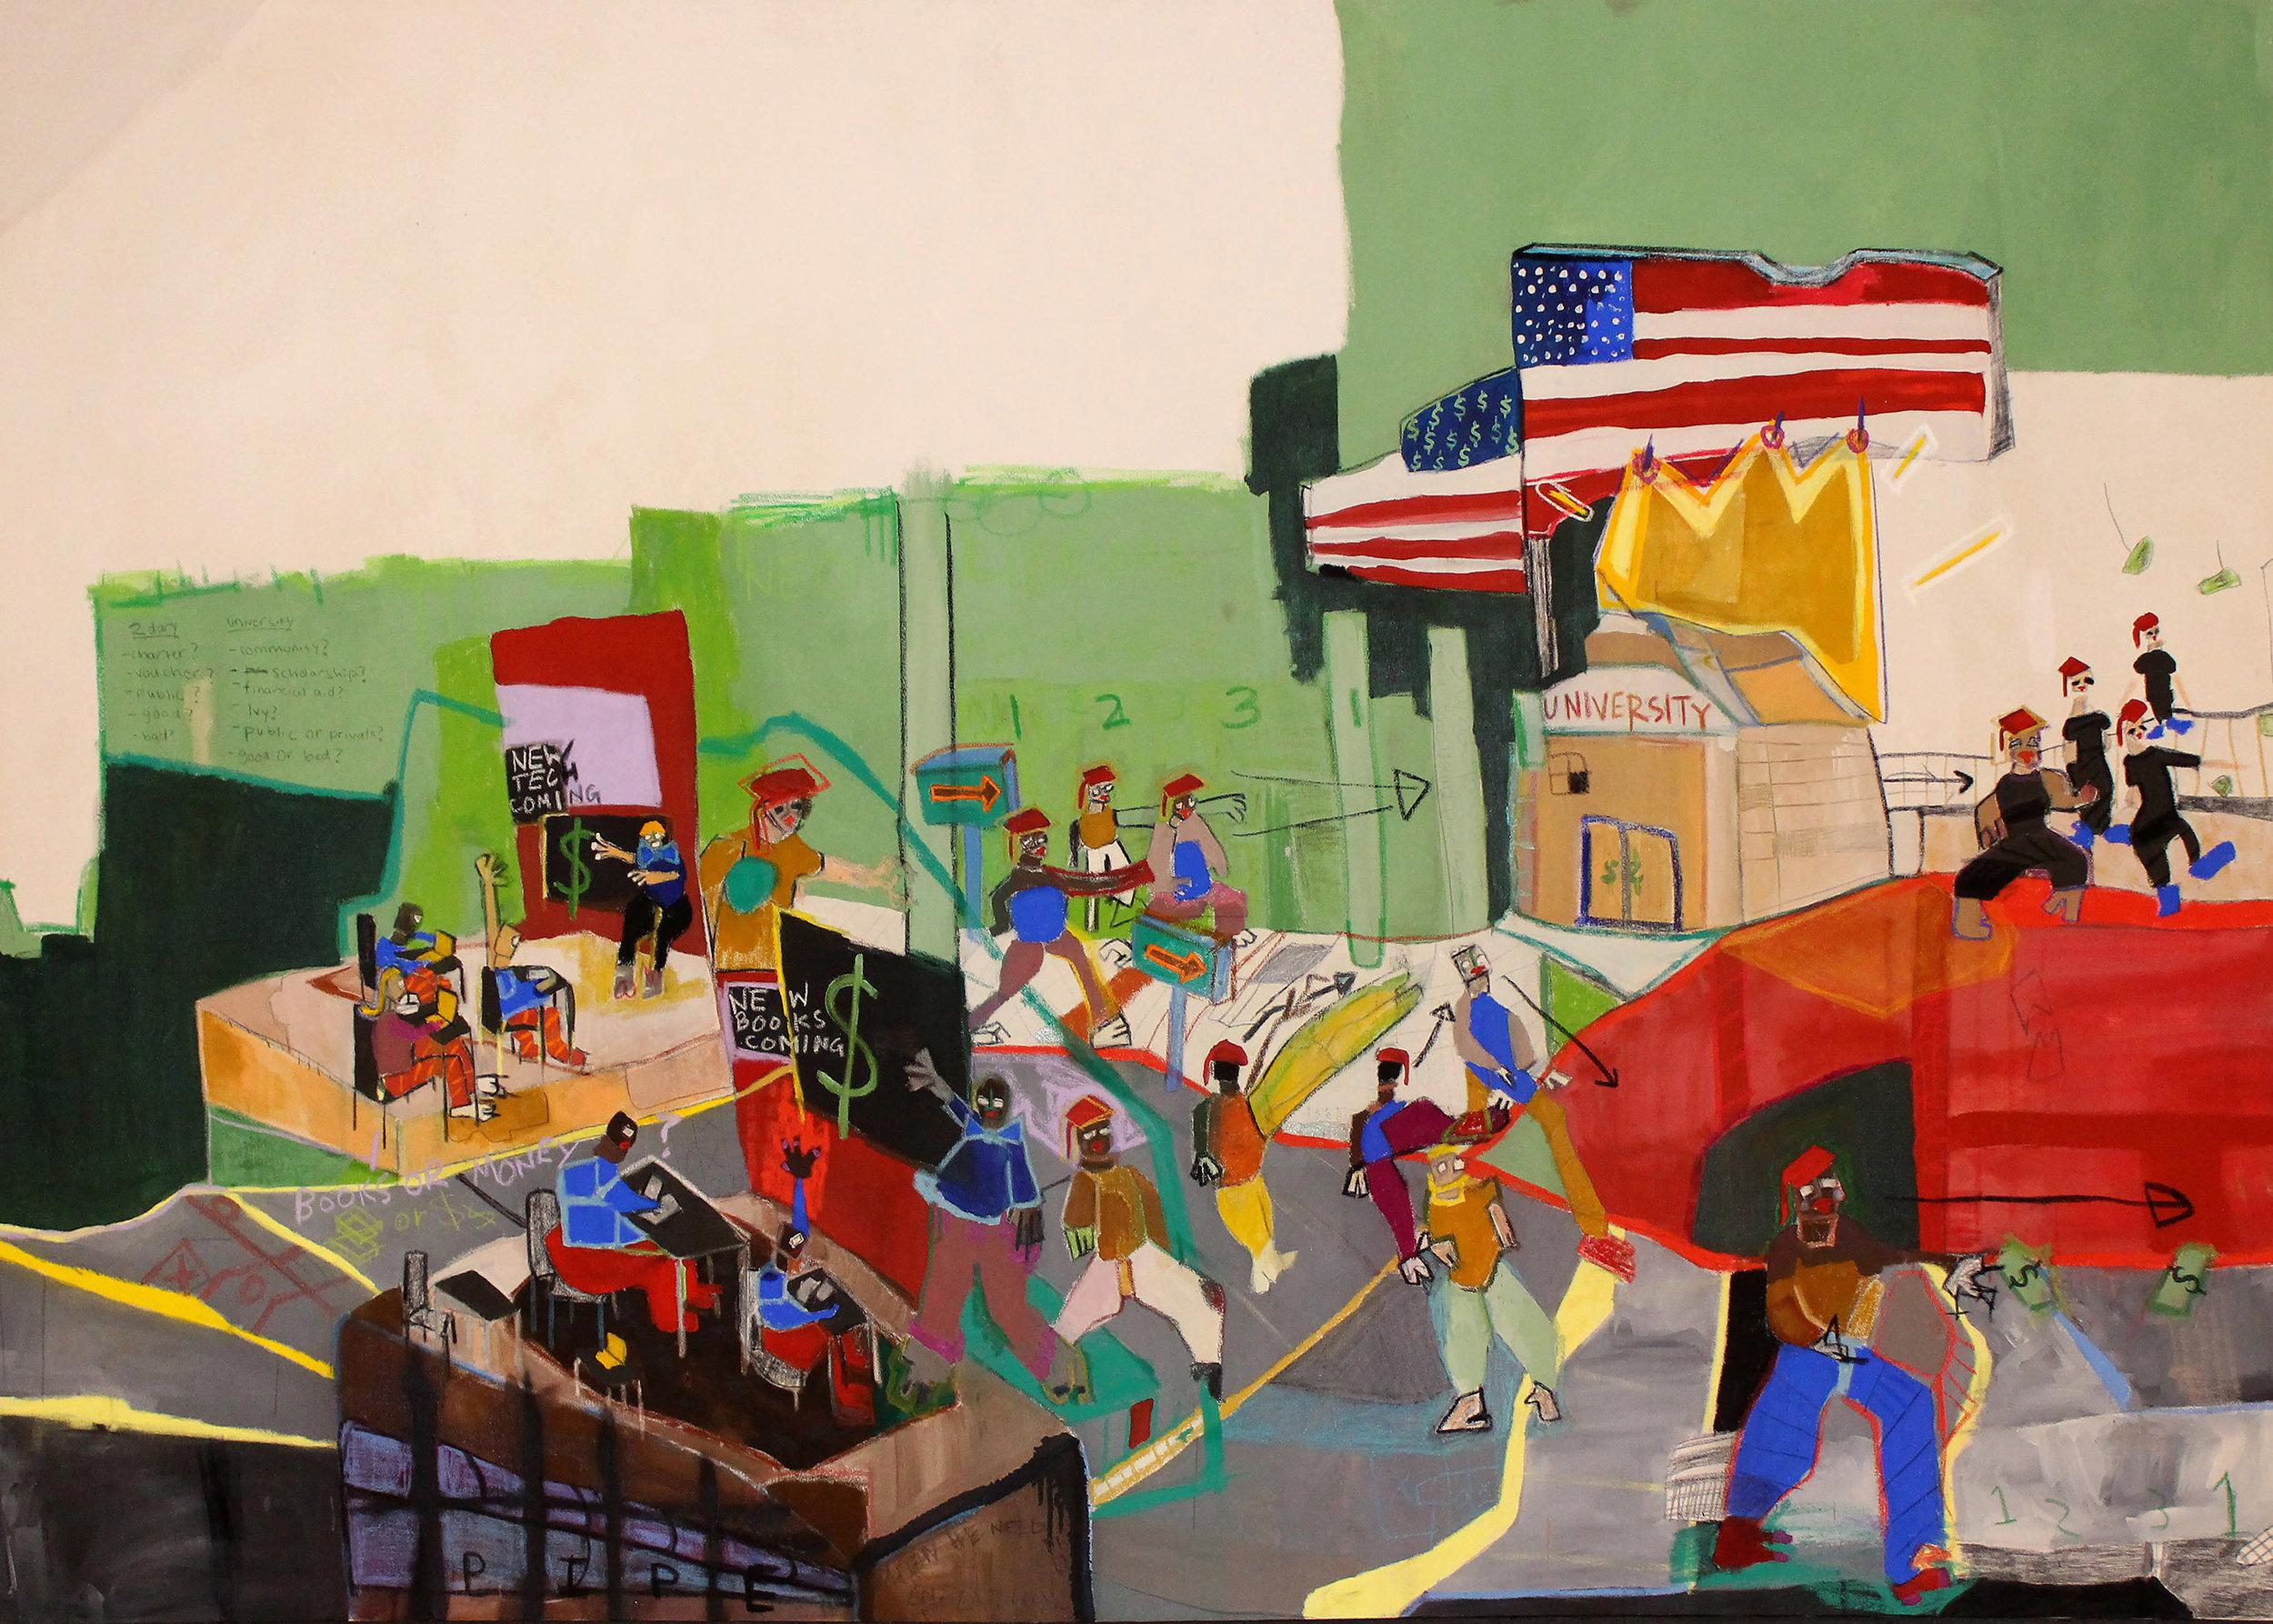 Income Inequality, Imagine Panel 2 8' x 5.5' Panel 2  ArtPrize 9 | Grand Rapids Art Museum